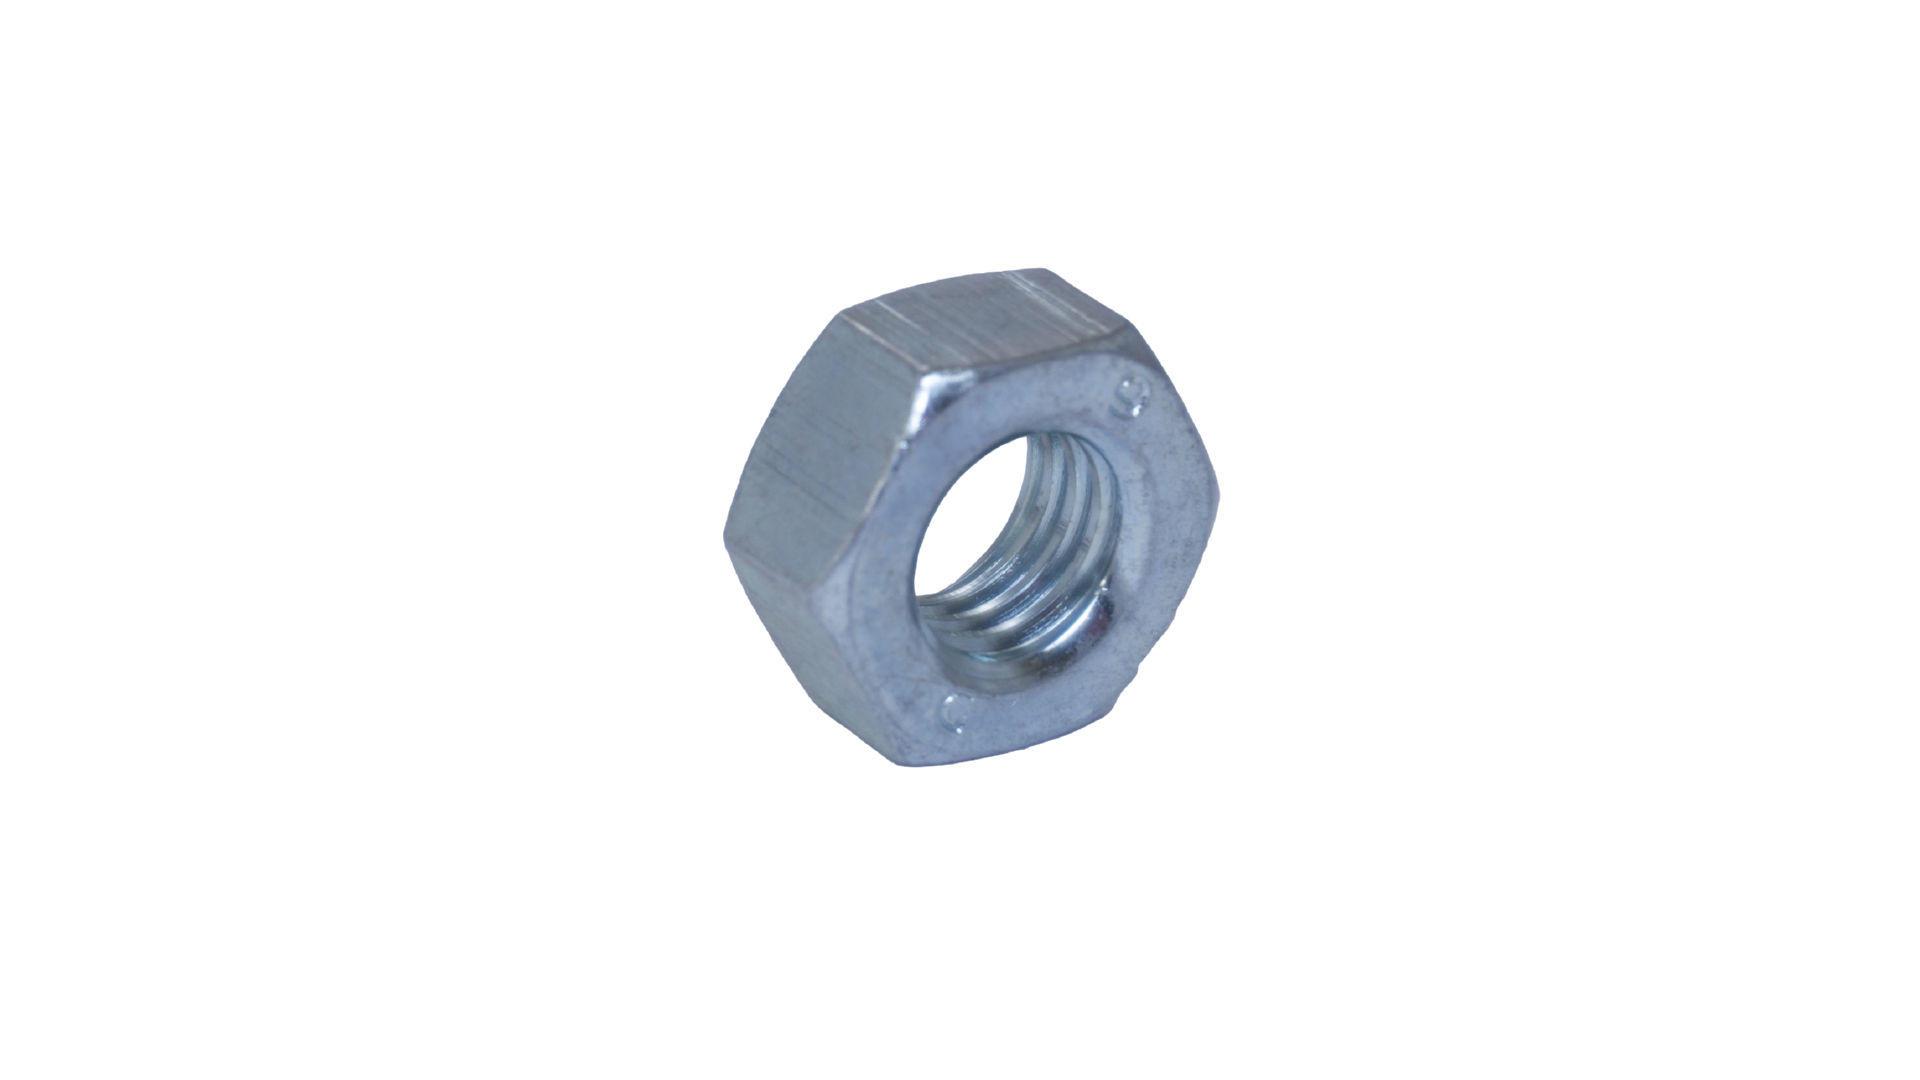 Гайка шестигранная Apro - М8 DIN 934 (100 шт.) 3